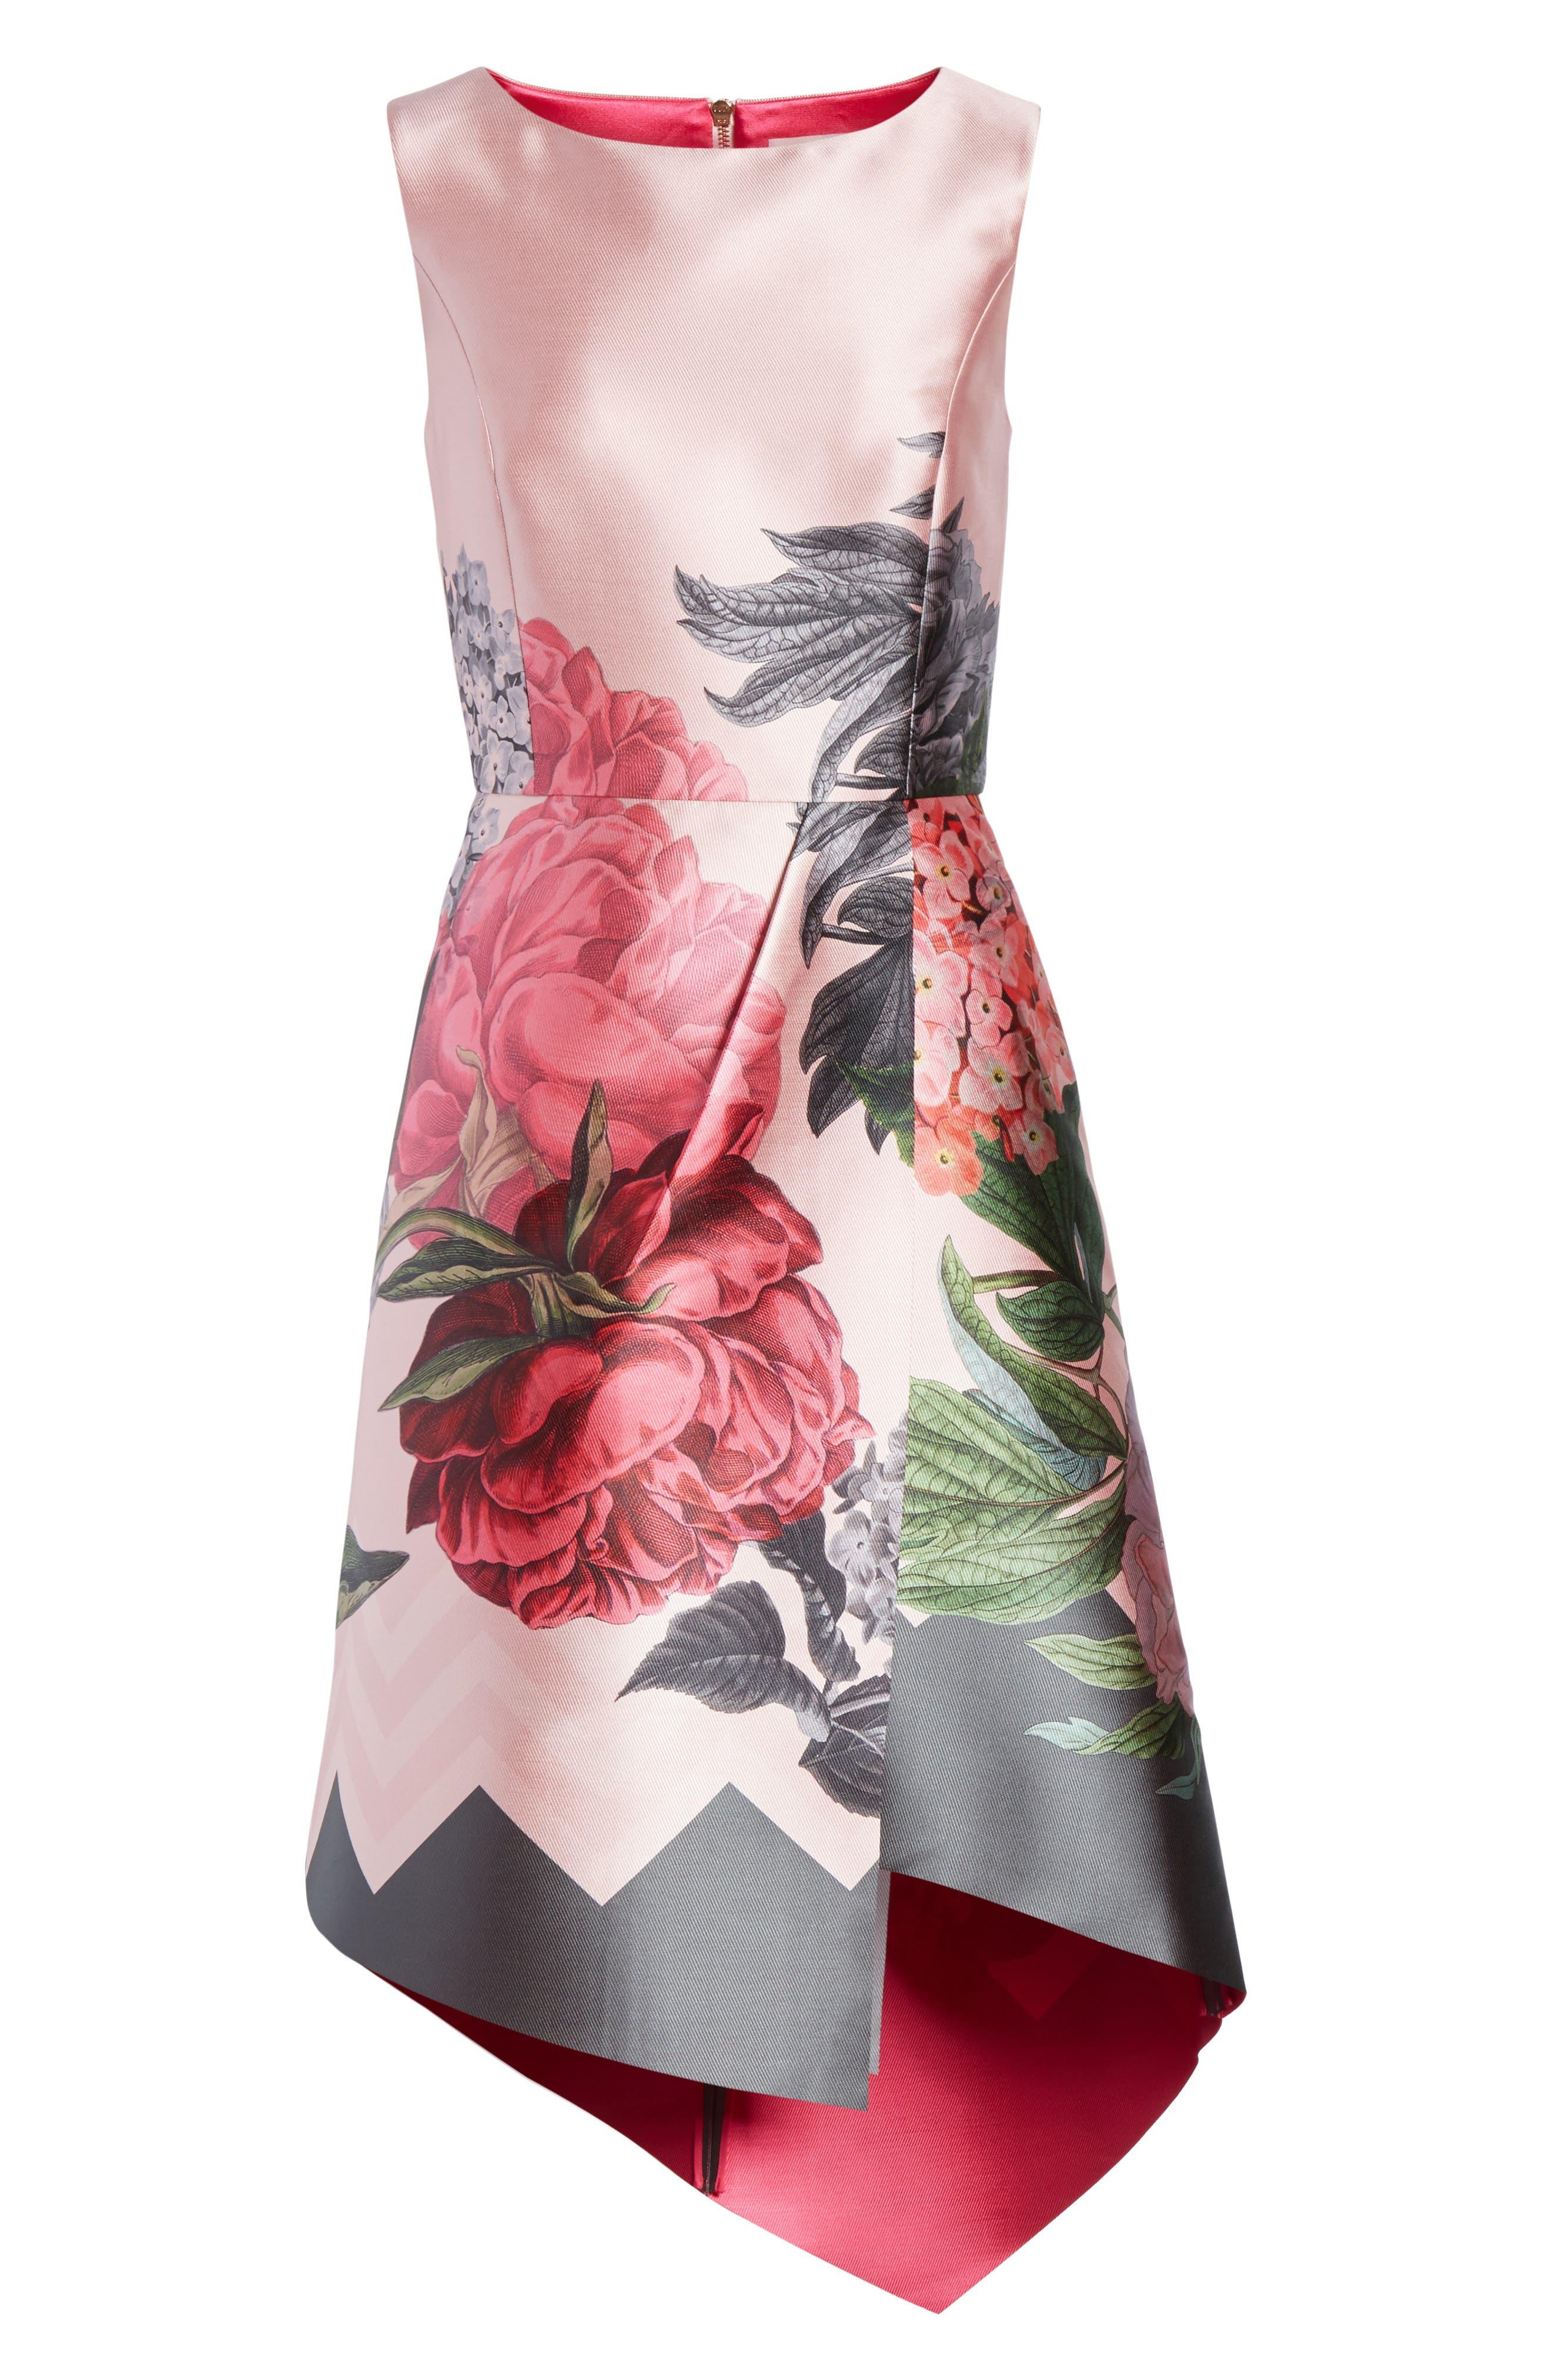 Palace Garden Faux Wrap Dress,                             Alternate thumbnail 6, color,                             Grey